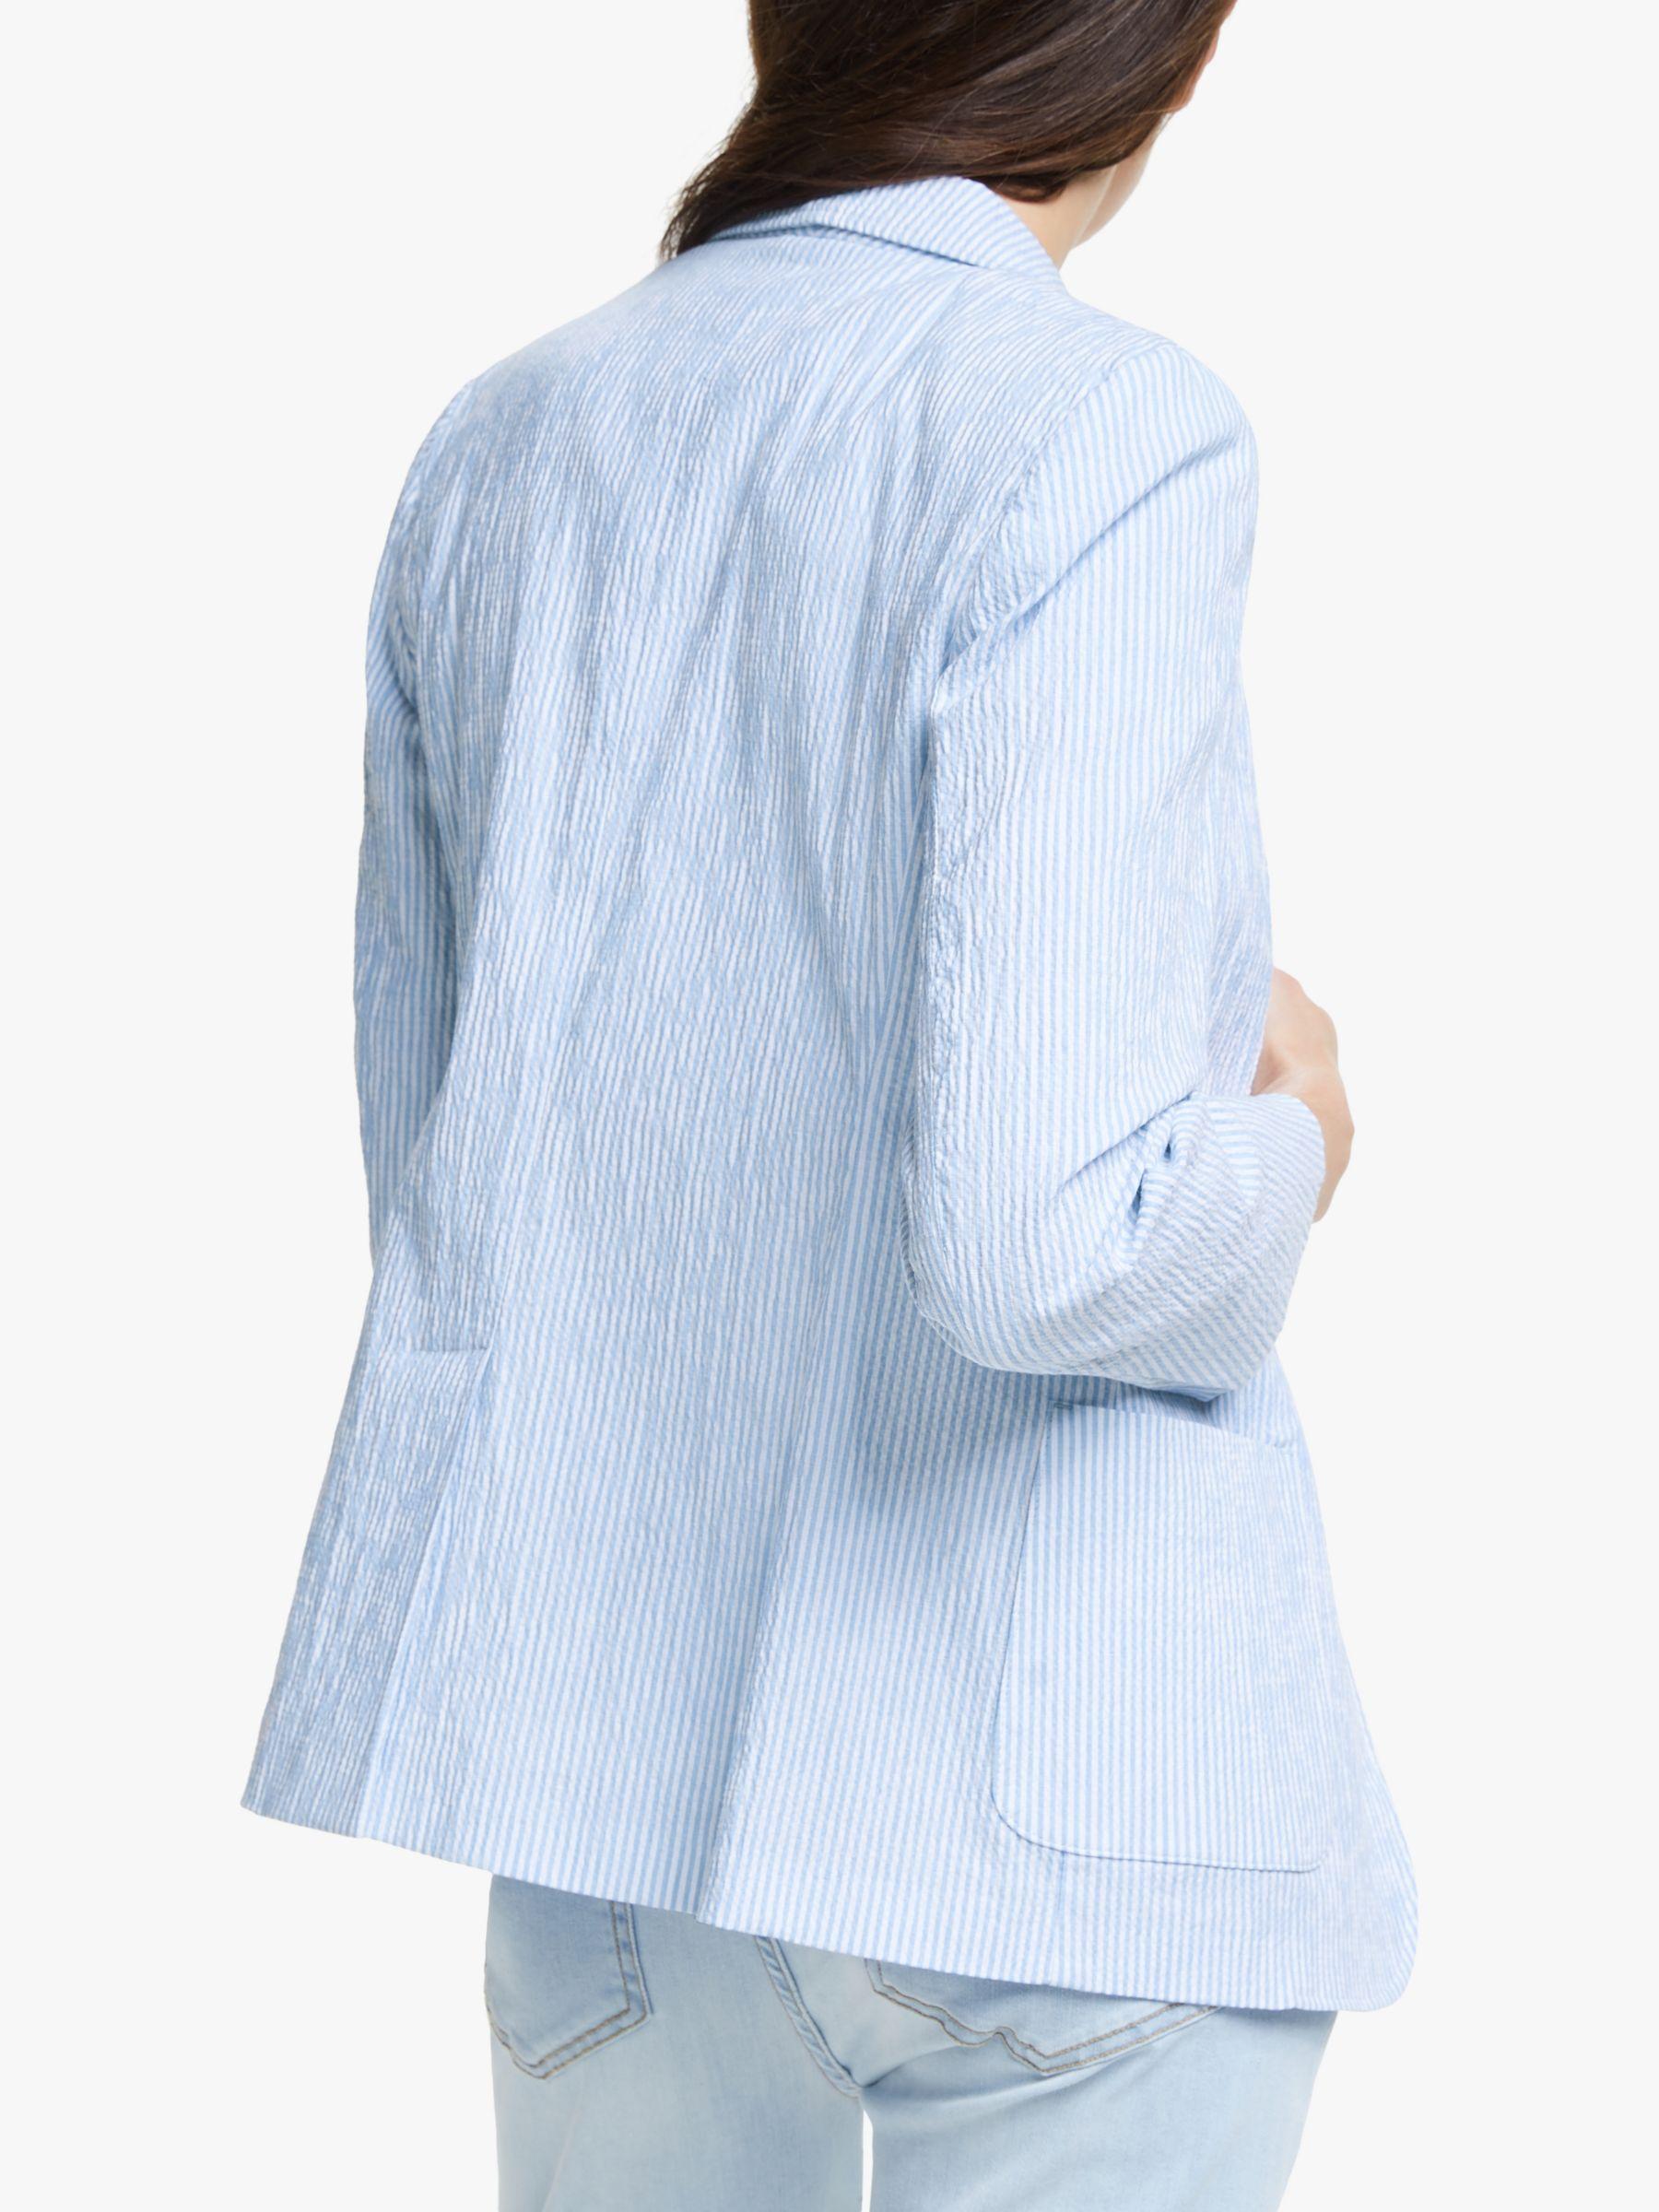 Blue Max Mara Weekend Coat Mark Cross Bag Manolo Blahnikhq Mules Via Halliedaily Blue Coat Outfit Light Blue Coat Outfit Blue Outerwear